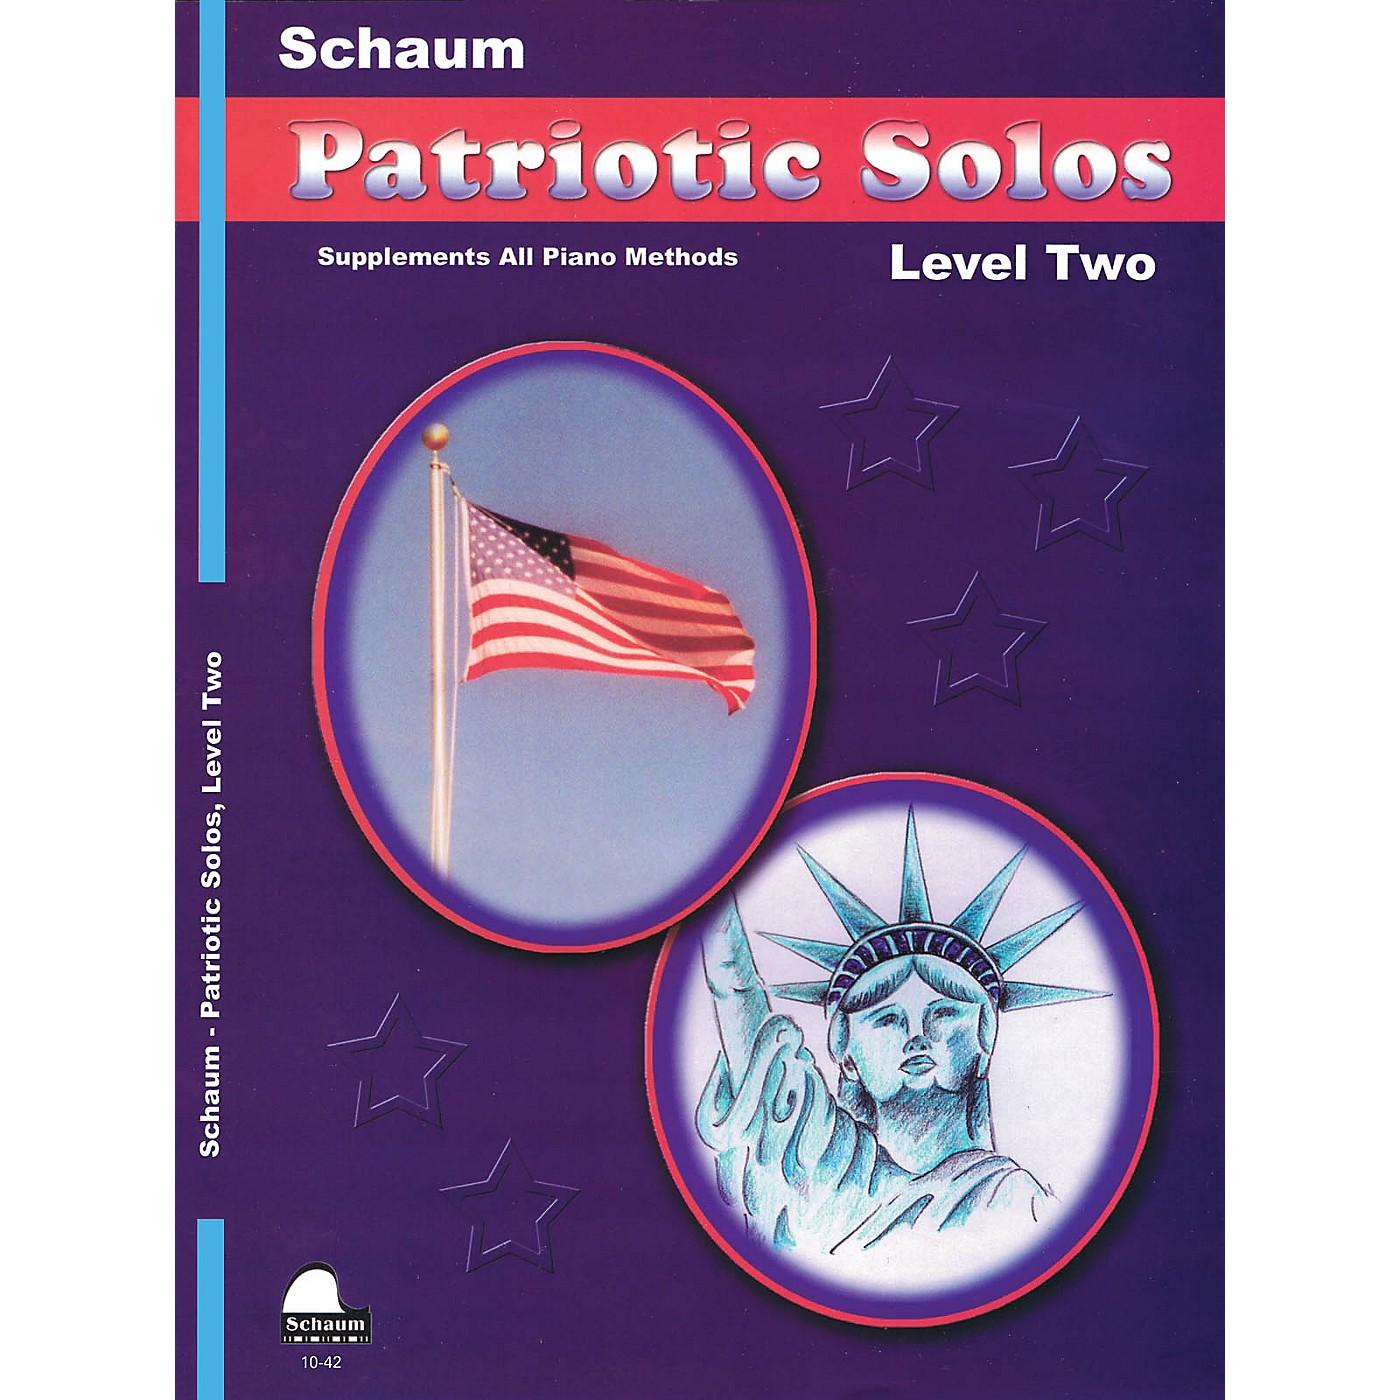 SCHAUM Patriotic Solos (Level 2 Upper Elem) Educational Piano Book thumbnail